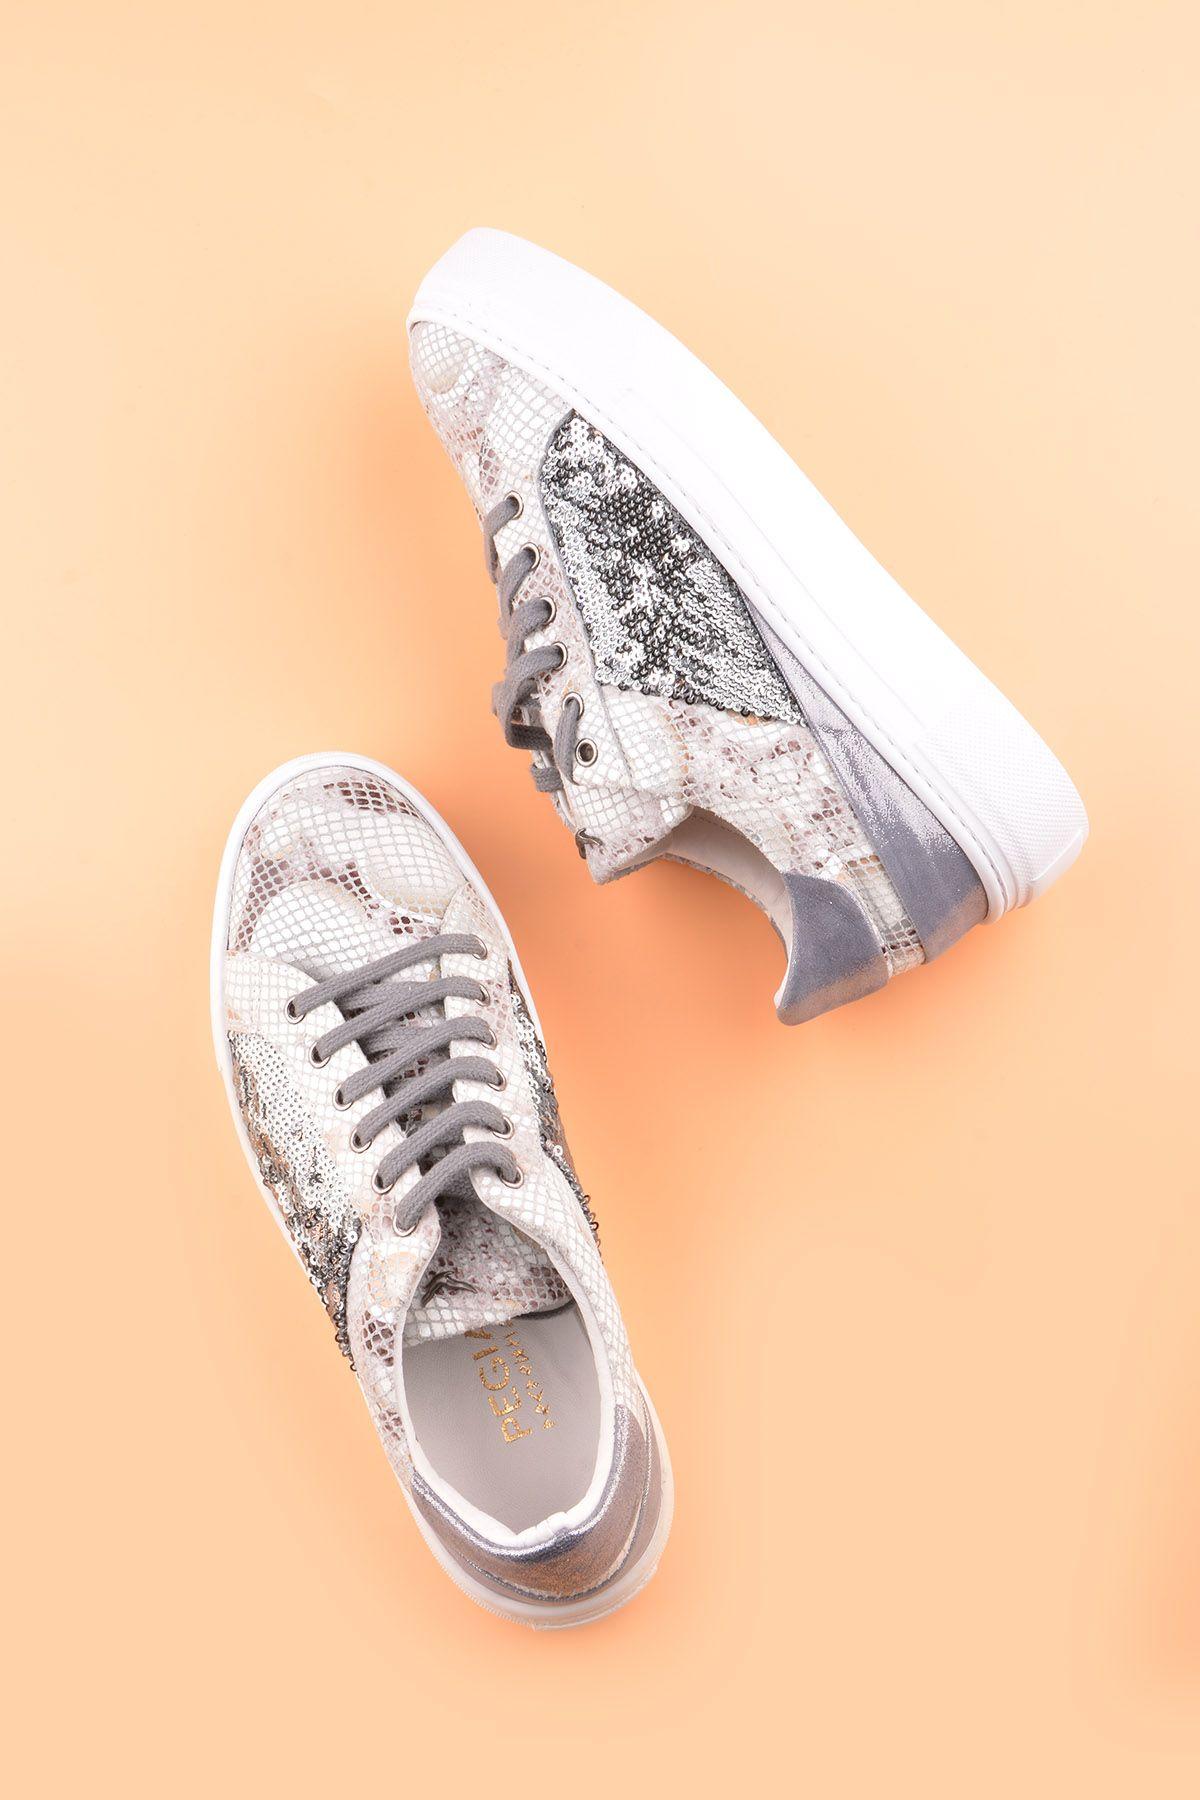 Pegia Blanche Hakiki Deri Bayan Spor Ayakkabı REC-002 Beyaz